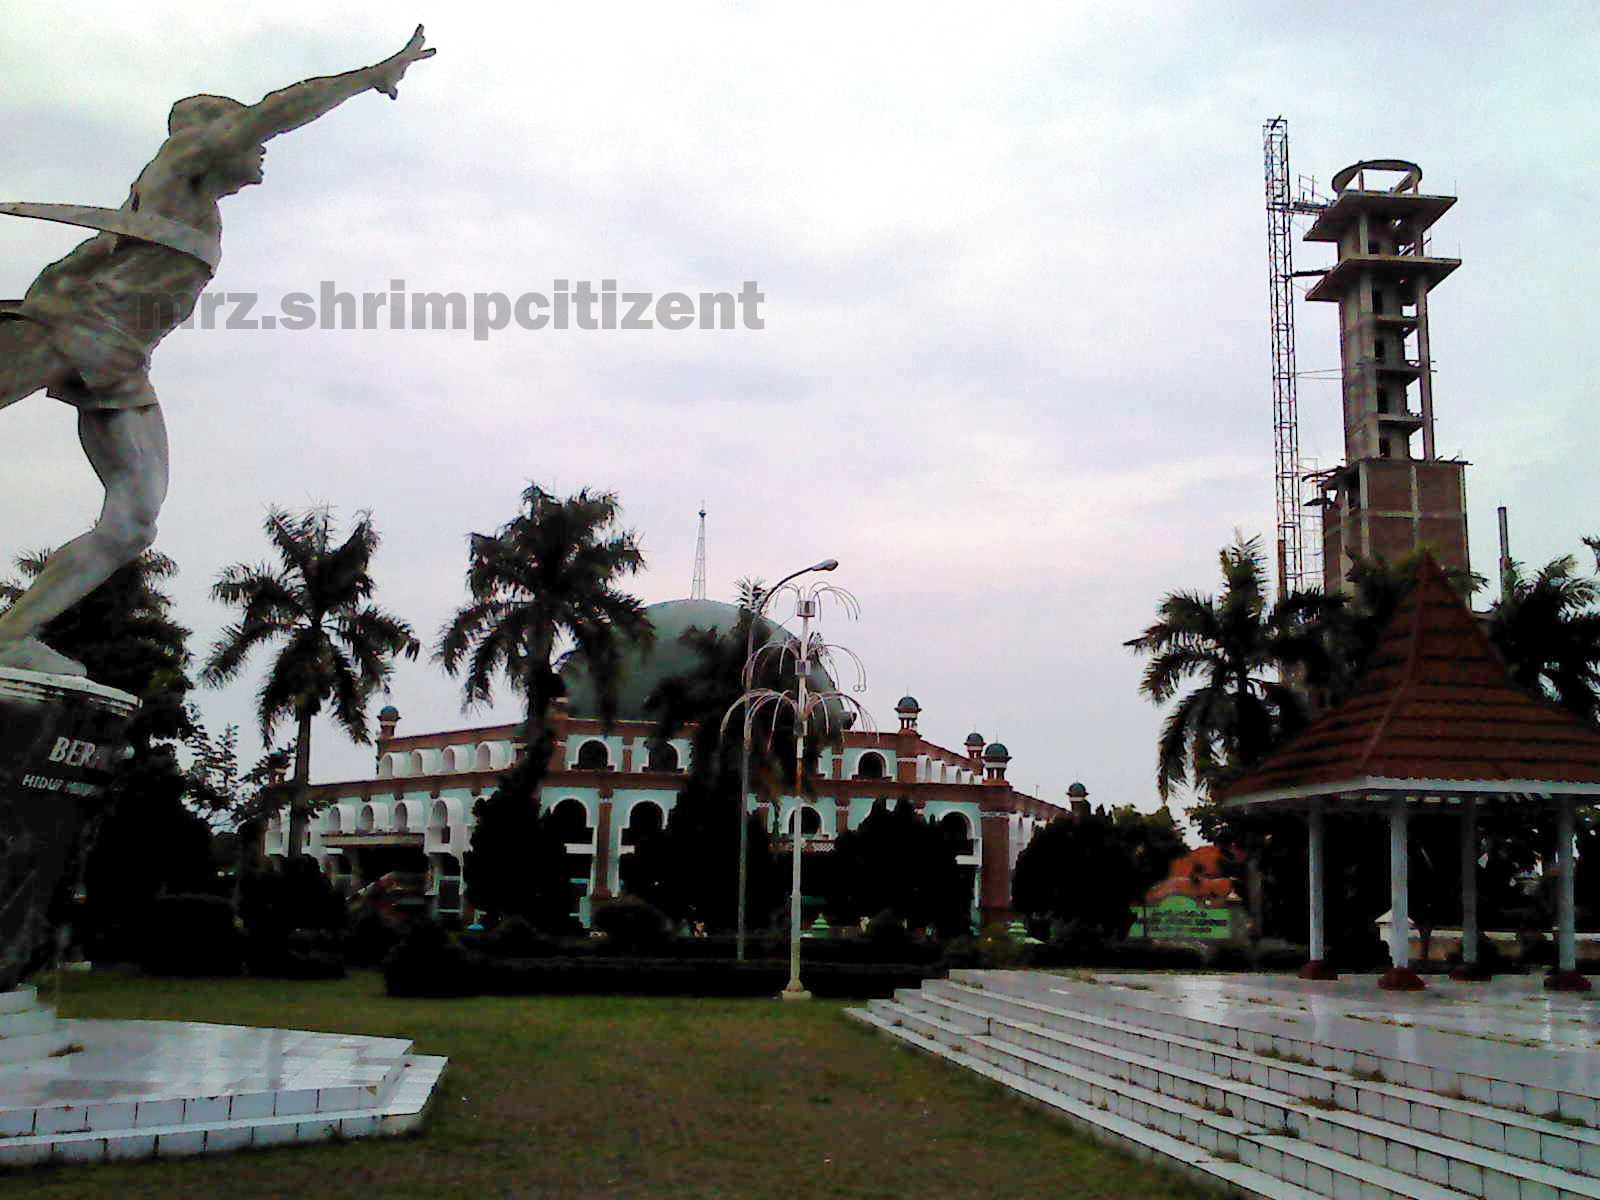 Pembangunan Menara Masjid Agung Sumber, Kab. Cirebon 3